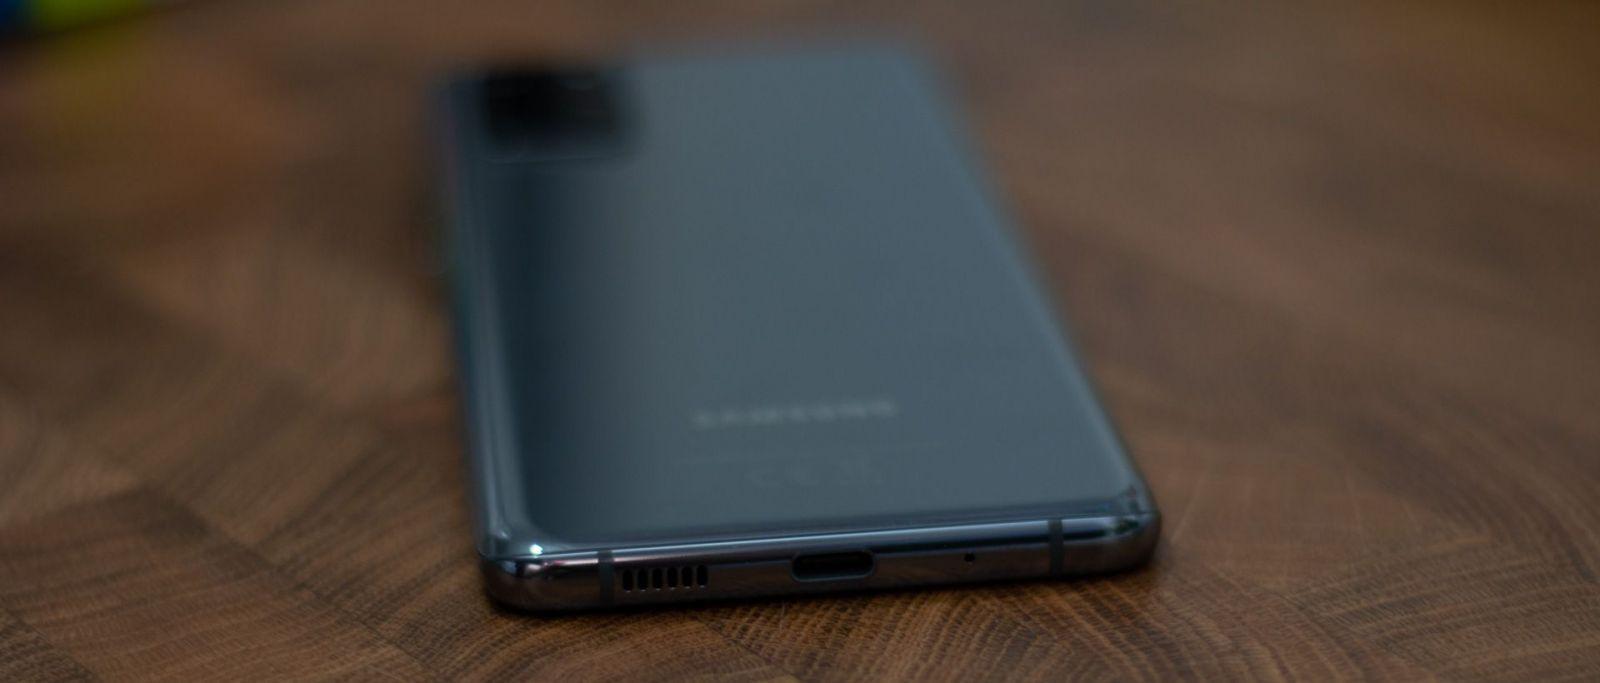 Премиум без изъянов. Обзор смартфона Samsung Galaxy S20+ (dsc 8723 e1595405043399)